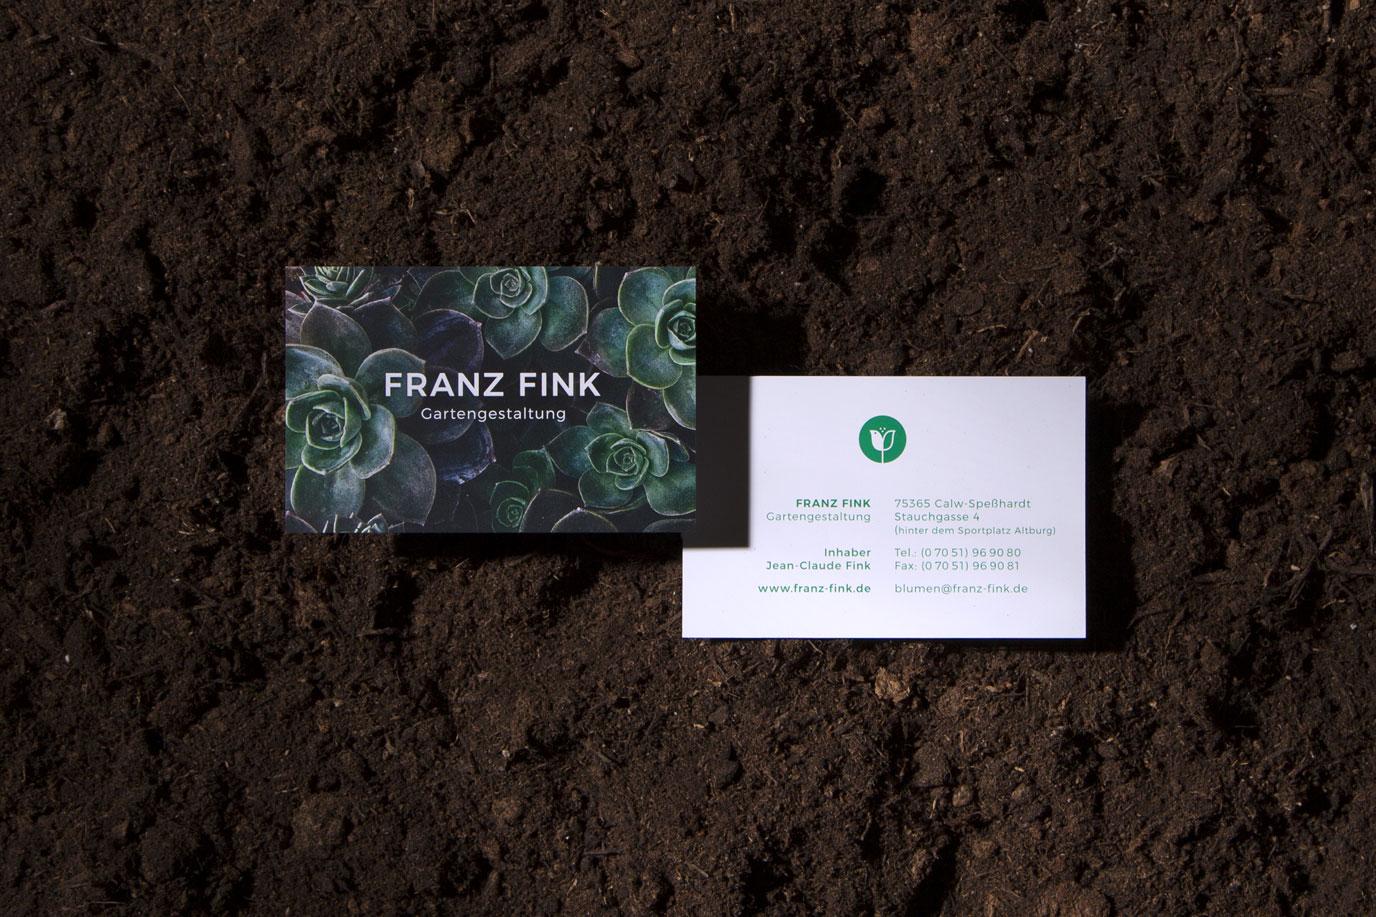 Visitenkarte Franz Fink Gartengestaltung